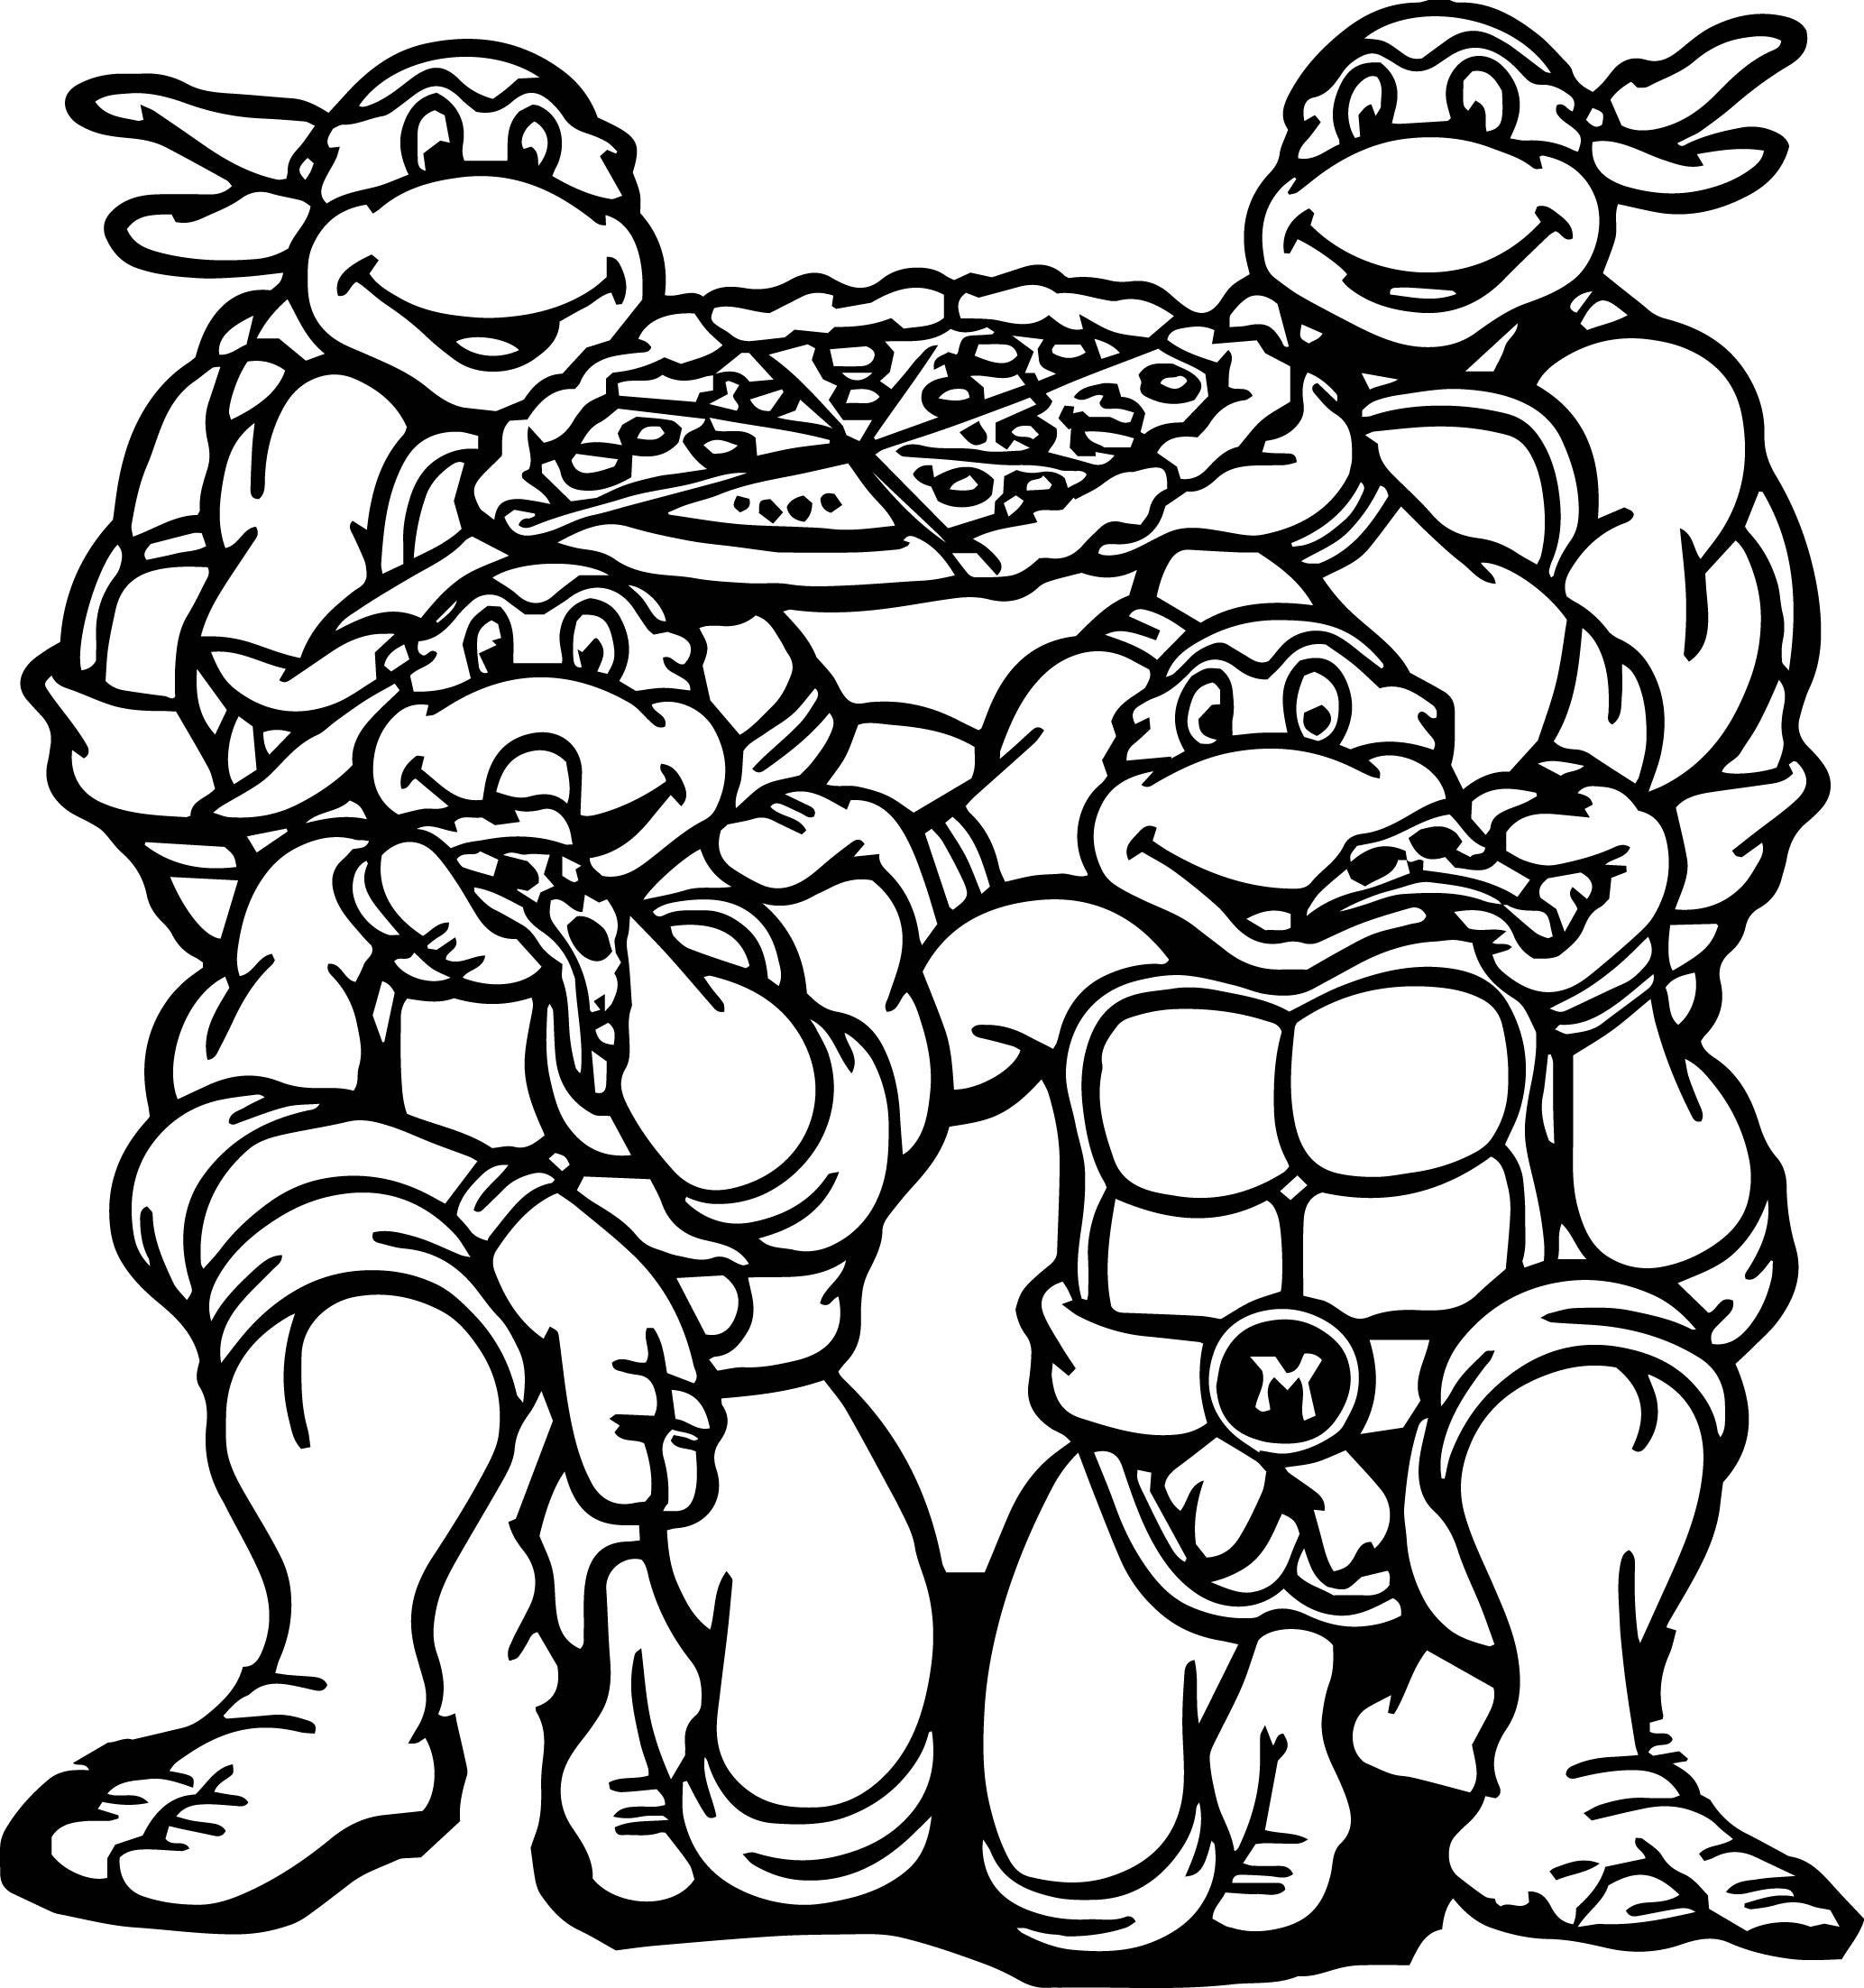 Teenage Mutant Ninja Turtles Coloring Book  Teenage Mutant Ninja Turtle Coloring Pages coloringsuite